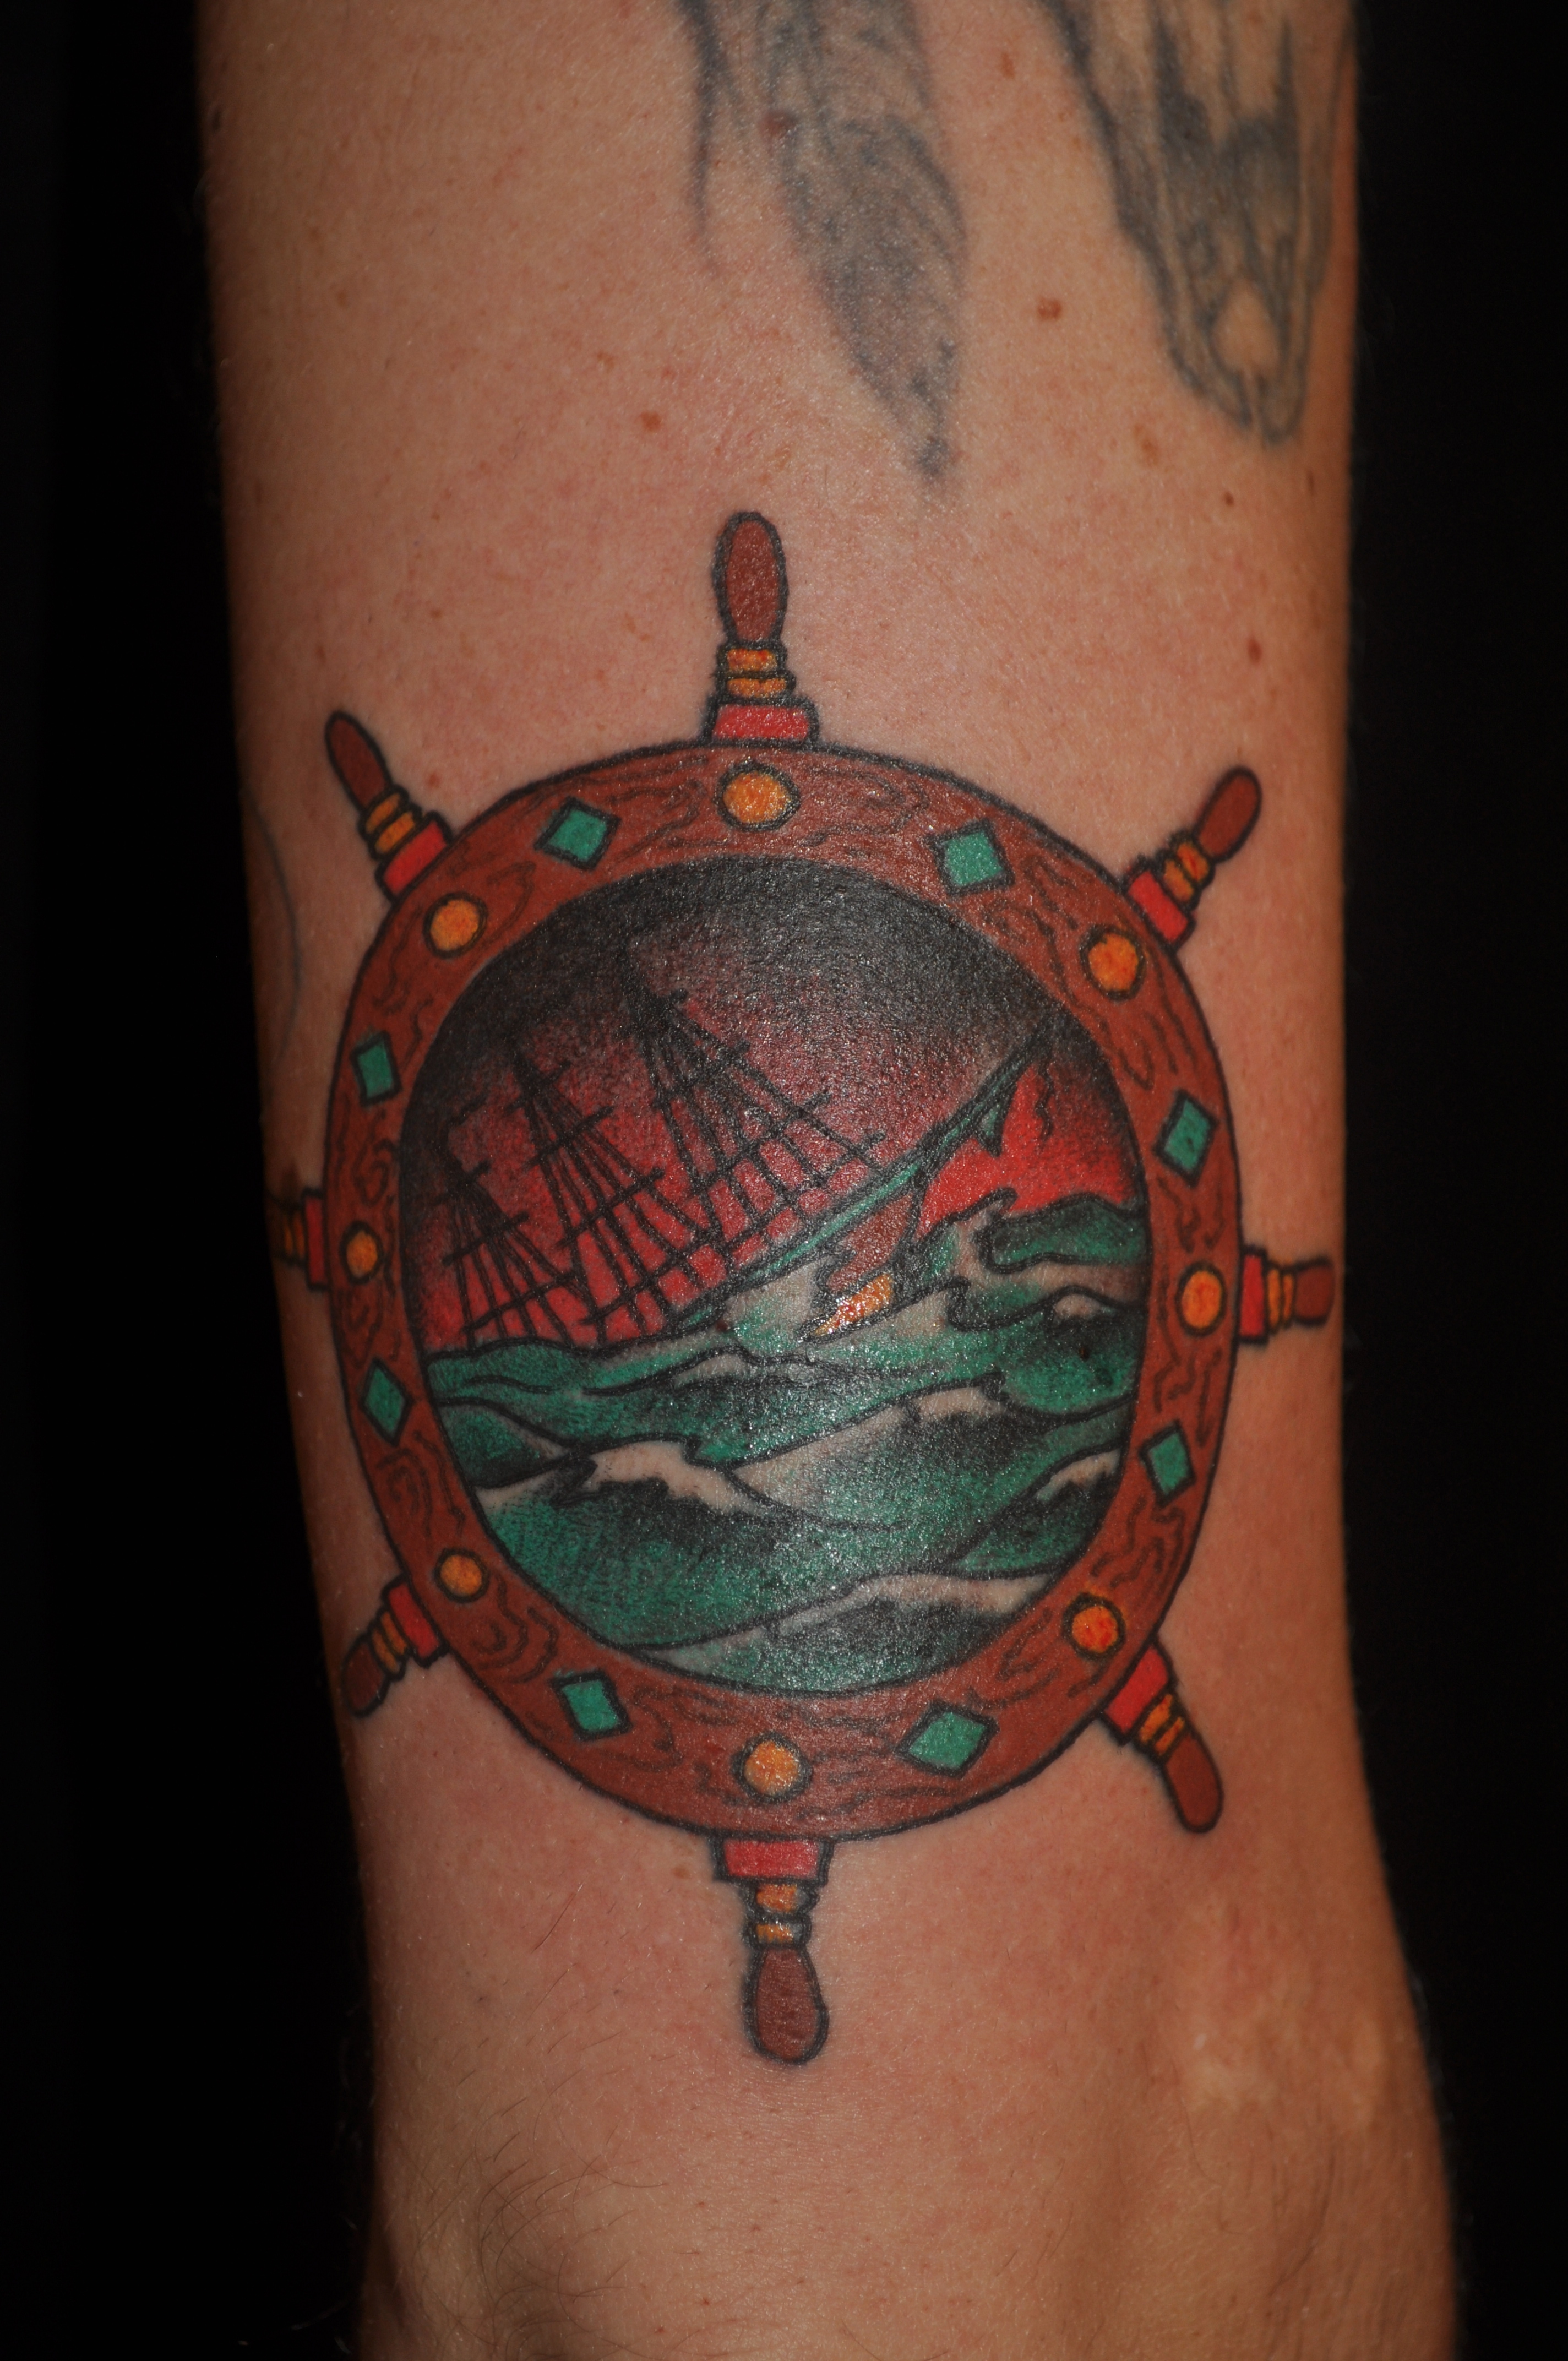 Rose Tattoo Amsterdam, Bill Loika, Traditional American, Tradional Western, Americana, Old school, color tattoos, Amsterdam tattoo shop